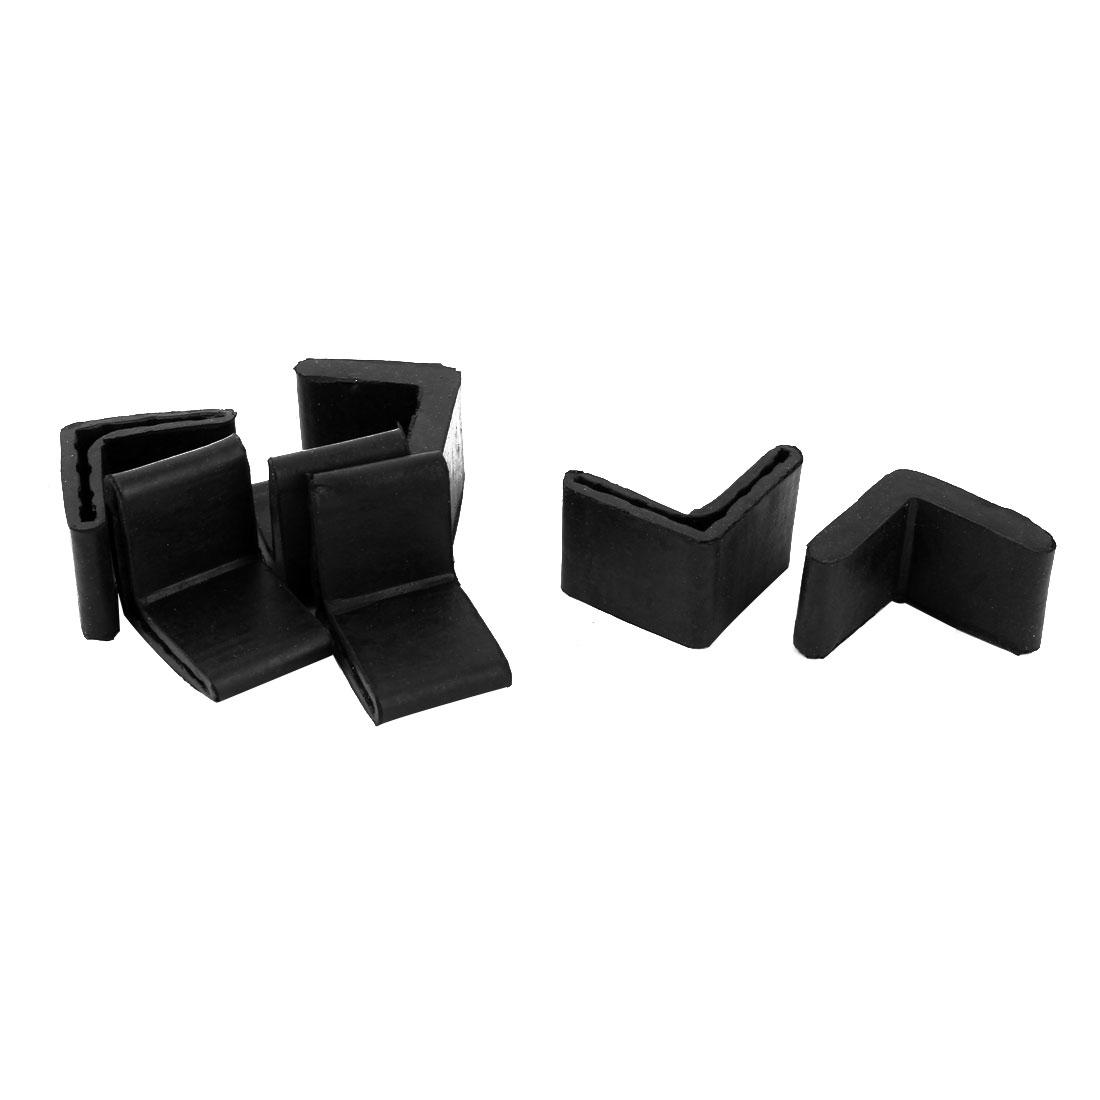 Office Rubber L Shape Furniture Foot Anti-slip Cover Black 35mm x 35mm 7 Pcs